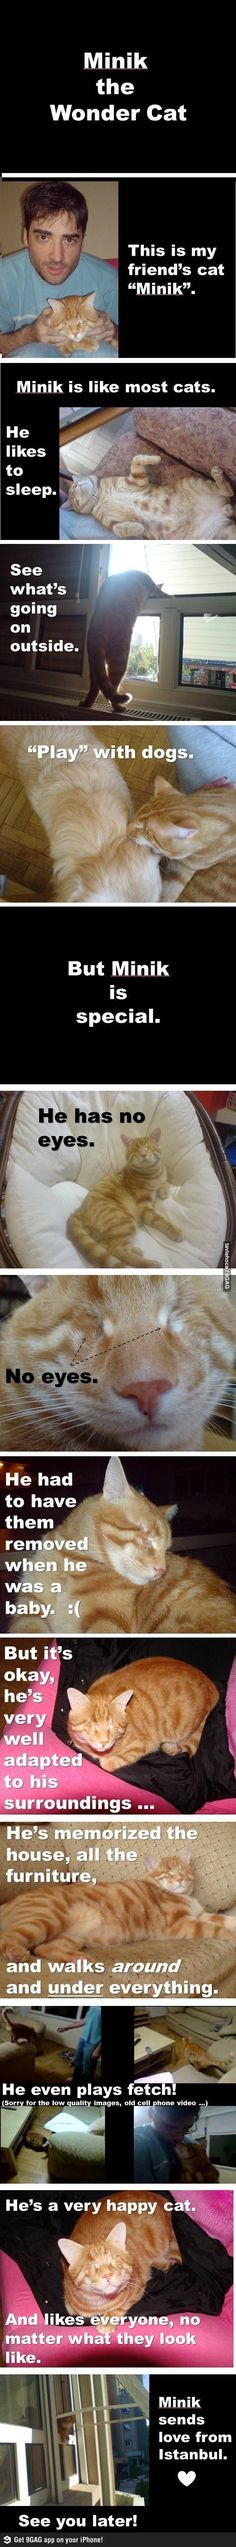 Aww my cat has one eye I can't imagine him not having any eyes!